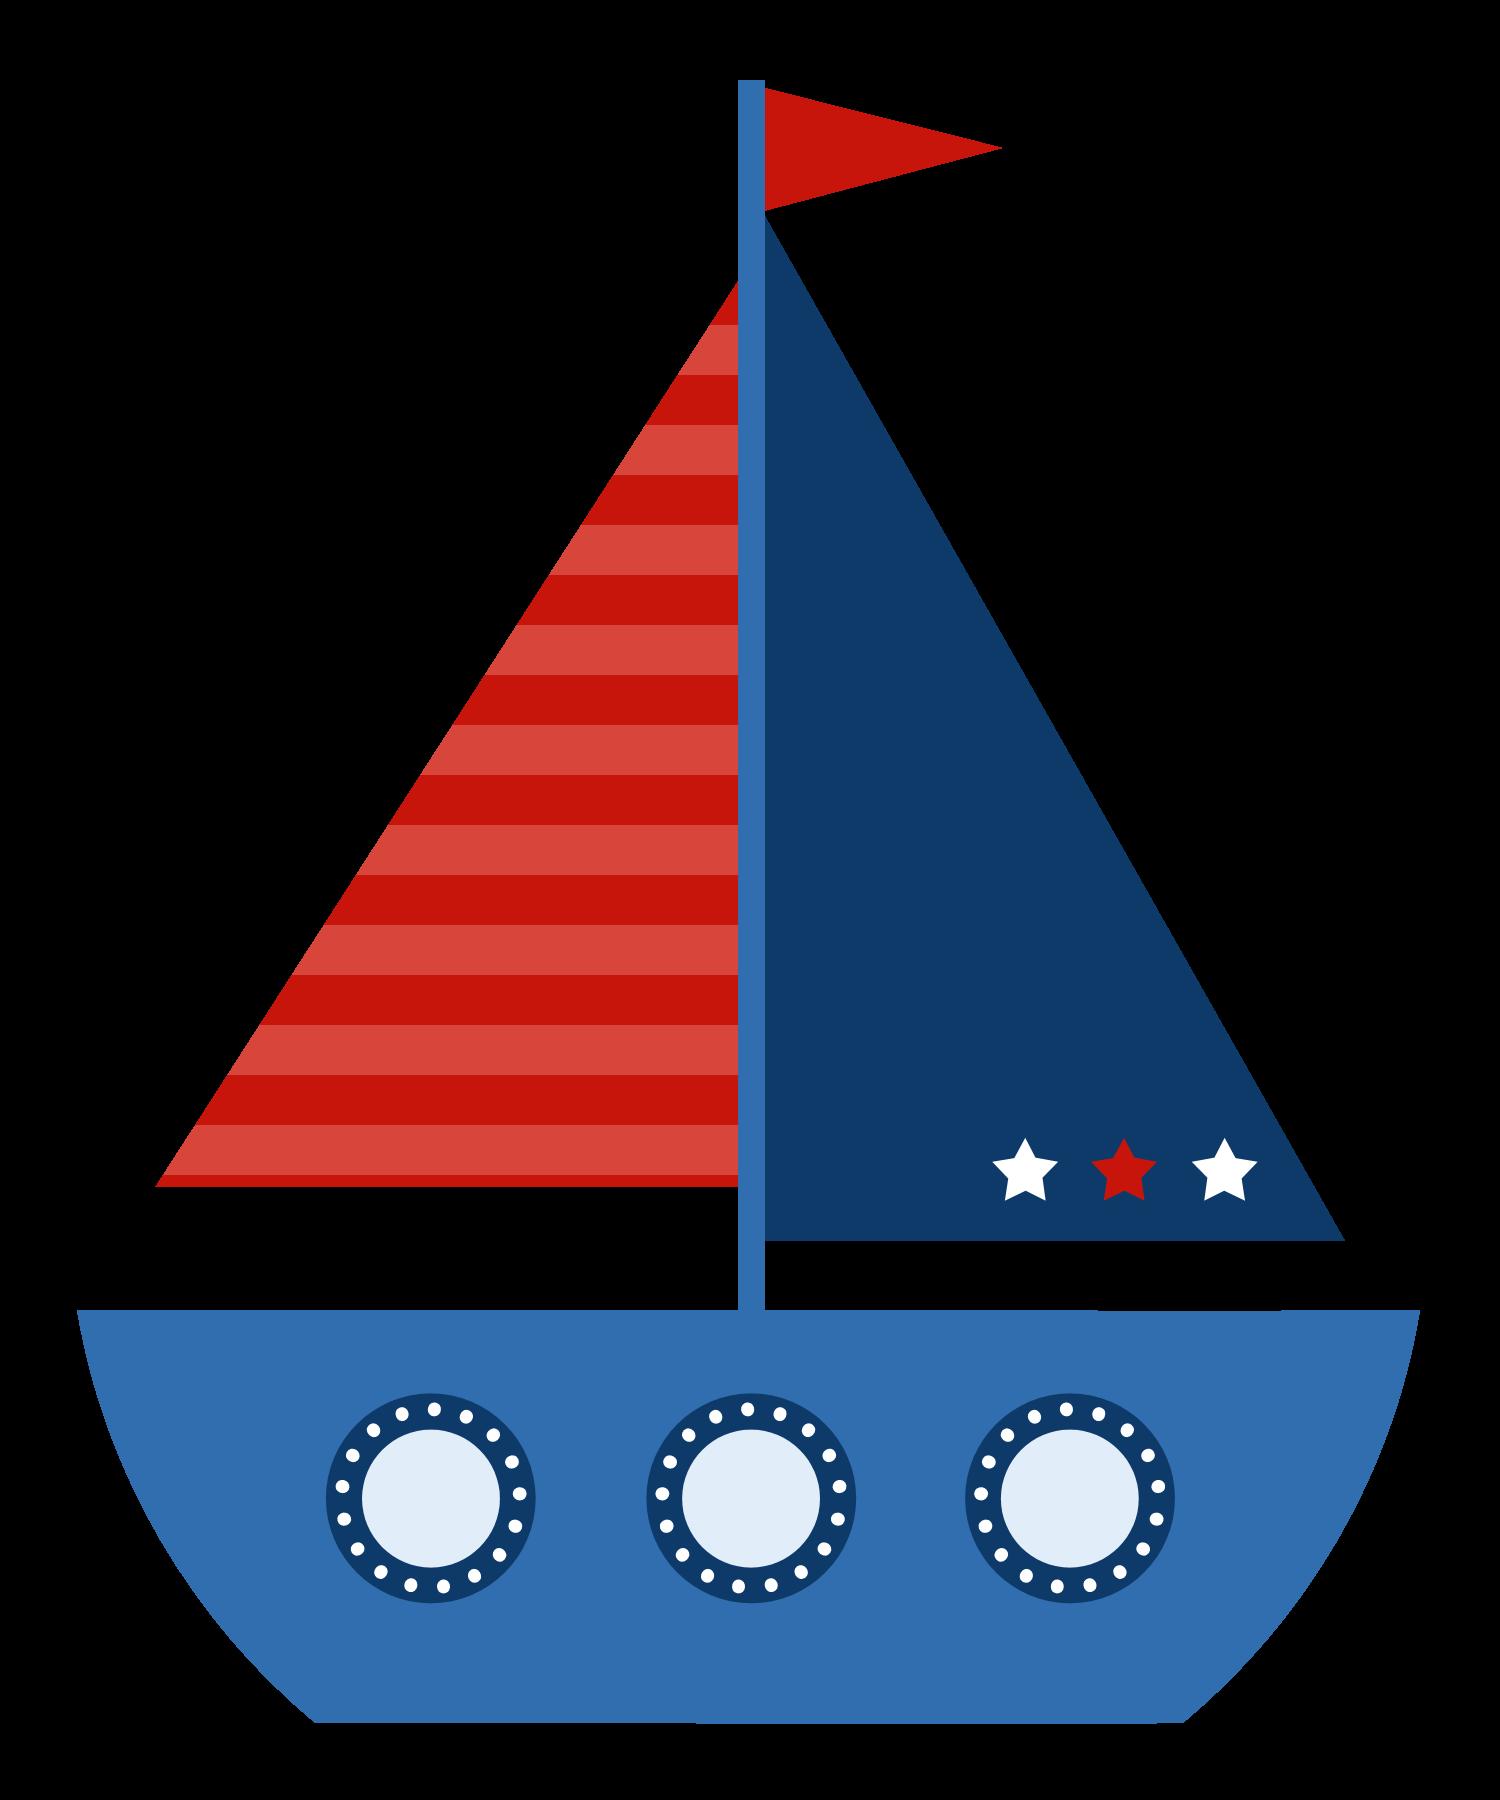 Hats clipart nautical. Corujinha beb png pesquisa